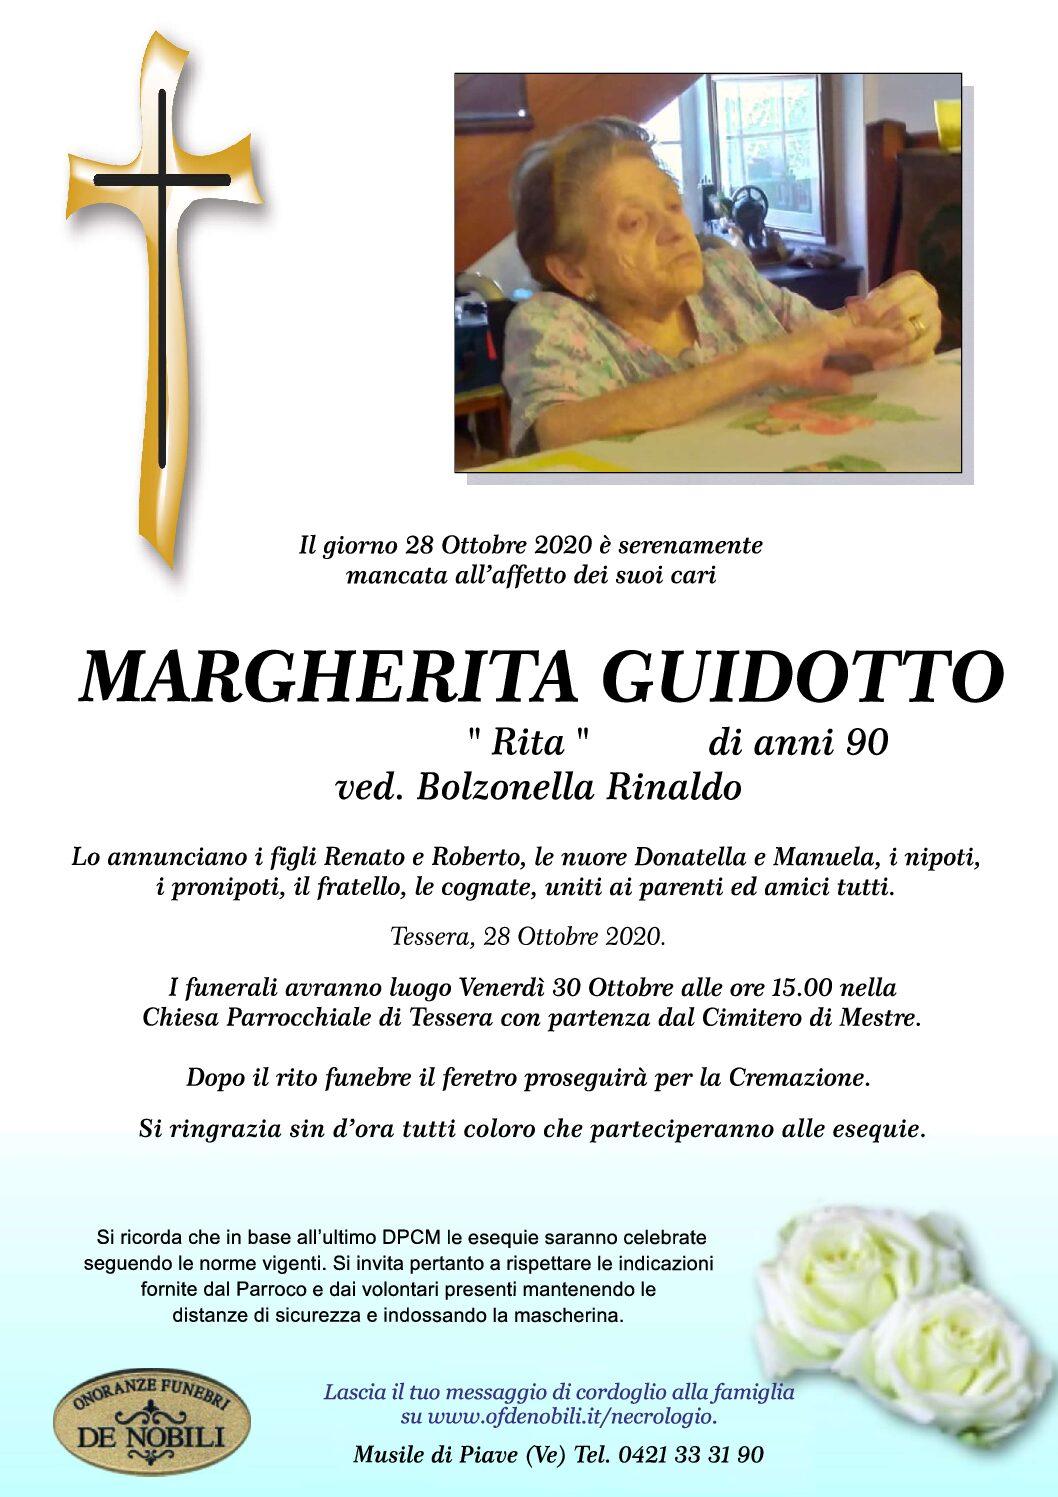 Margherita Guidotto